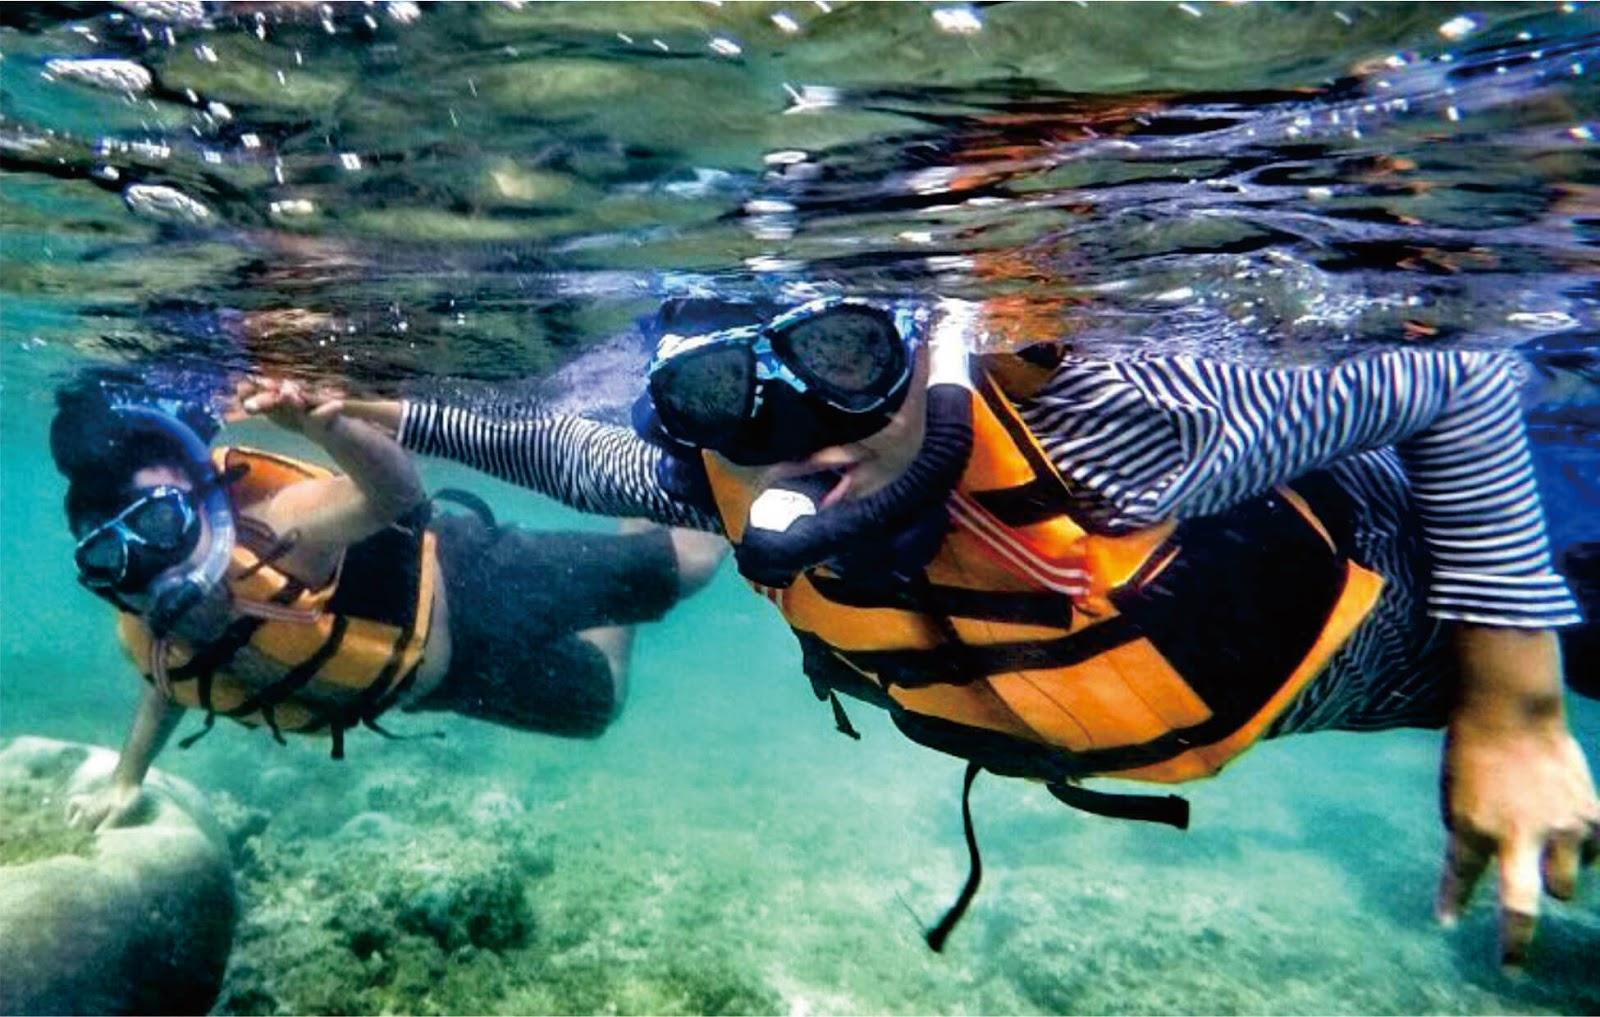 Menyelam Di Pantai Nglambor Yogyakarta Jamelatour 081578781230